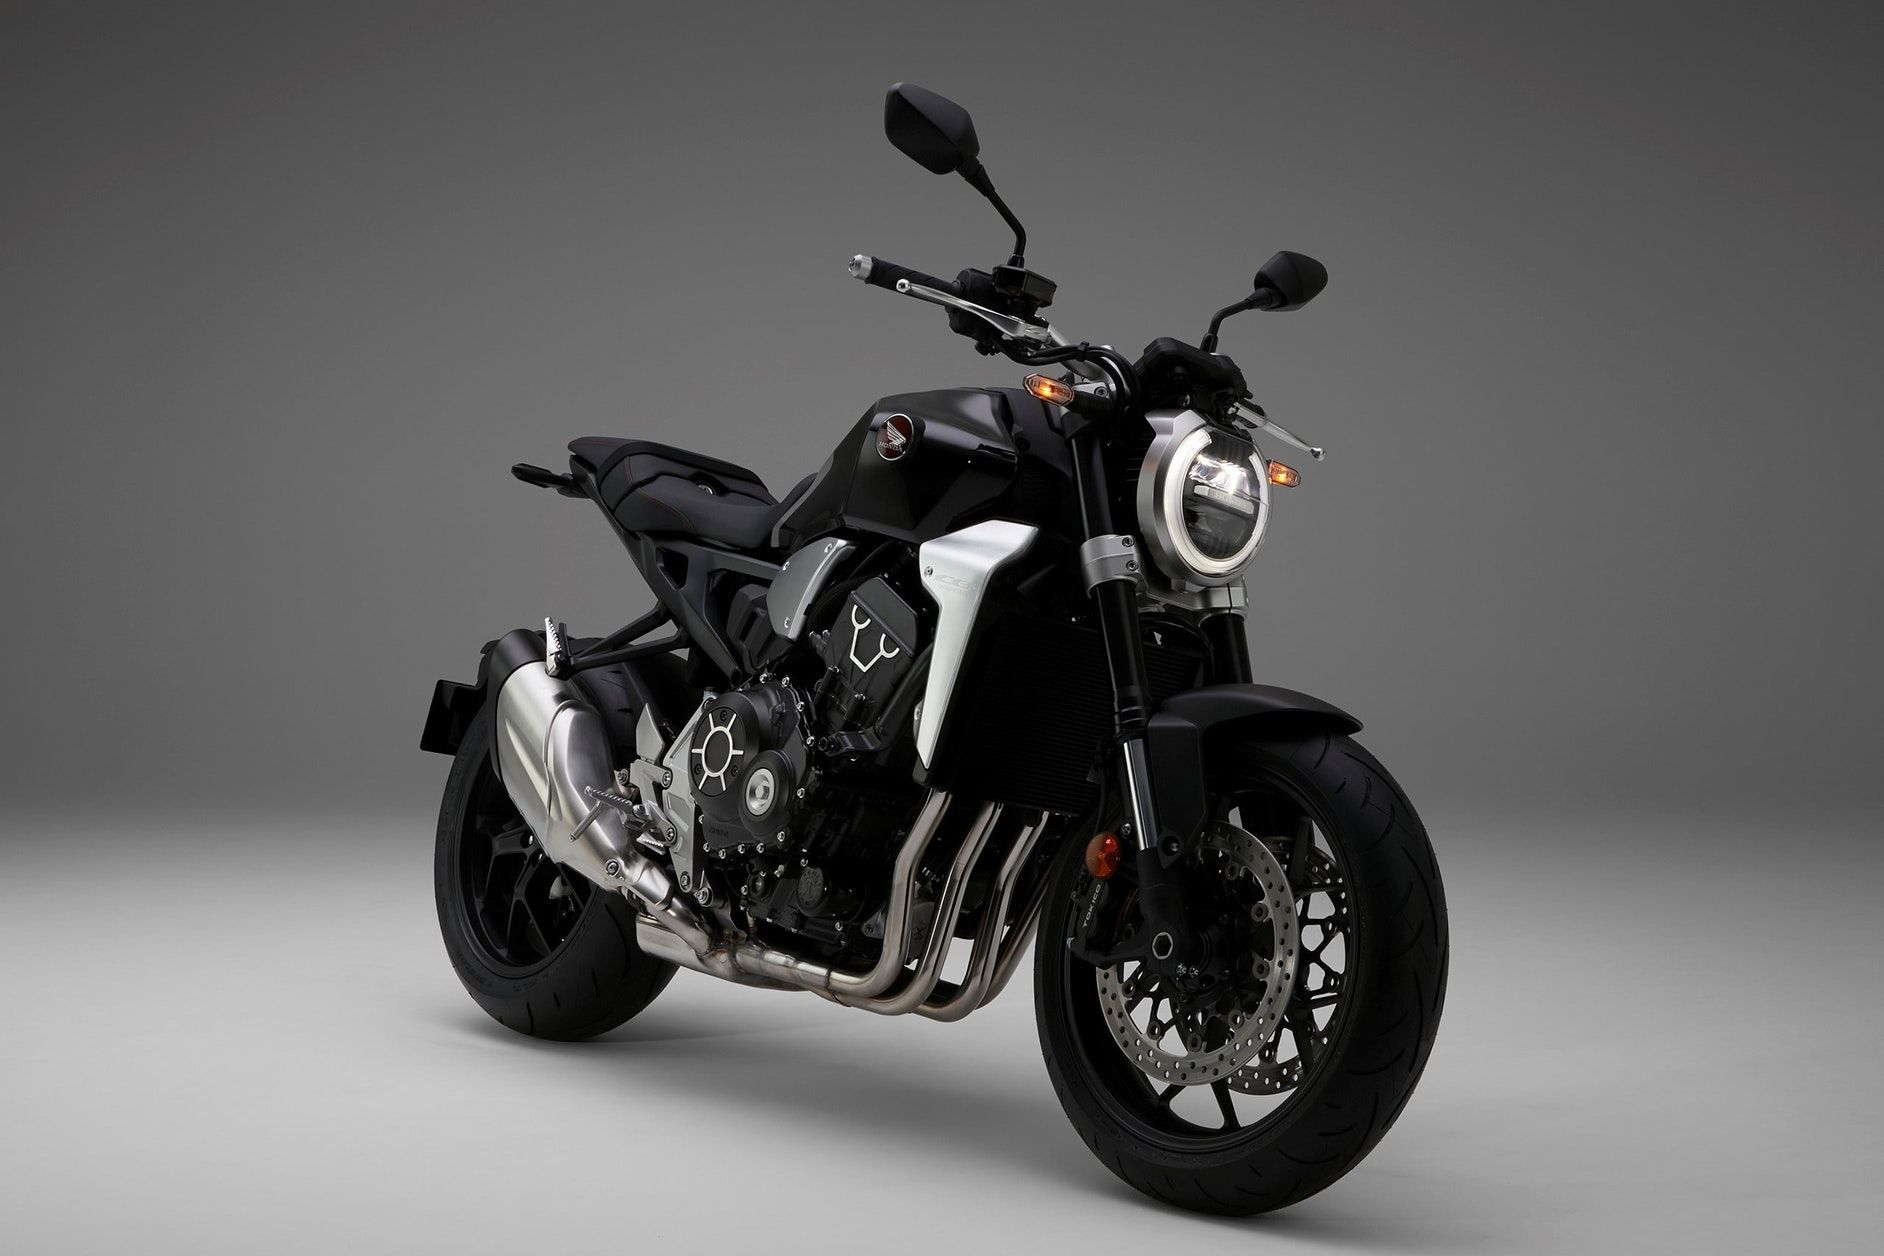 2018 Honda CB1000R First Look - Cycle News